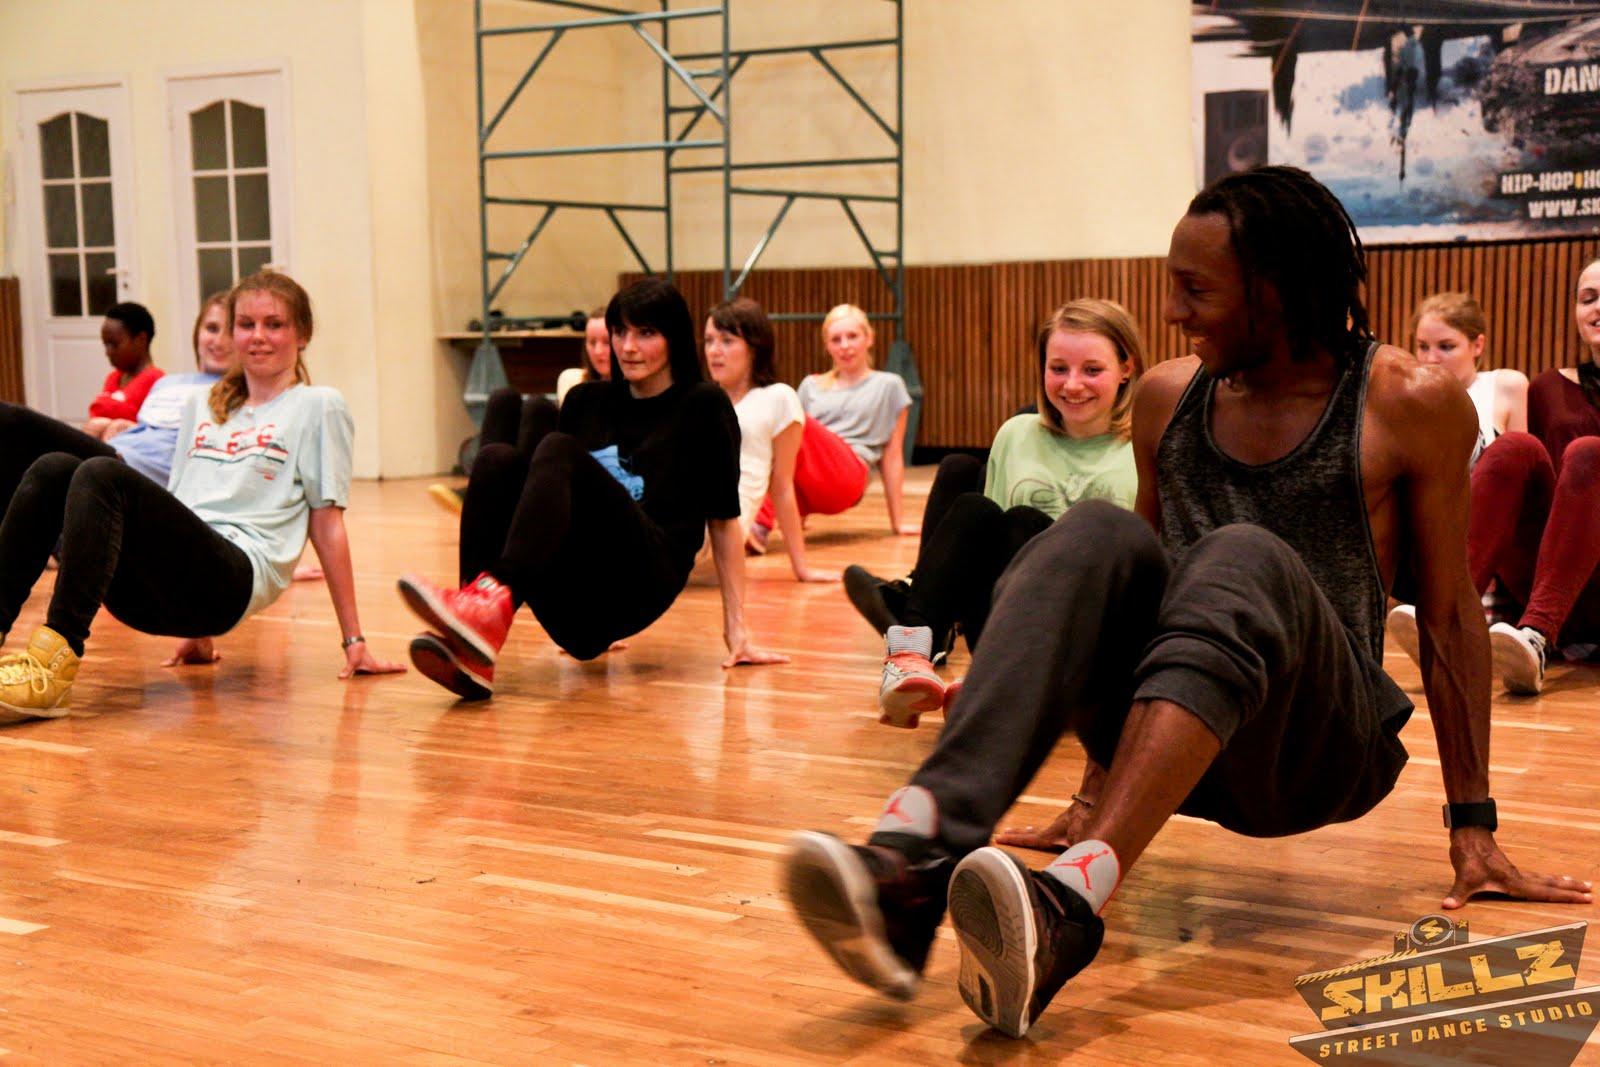 Dancehall workshop with Camron One Shot - IMG_8013.jpg